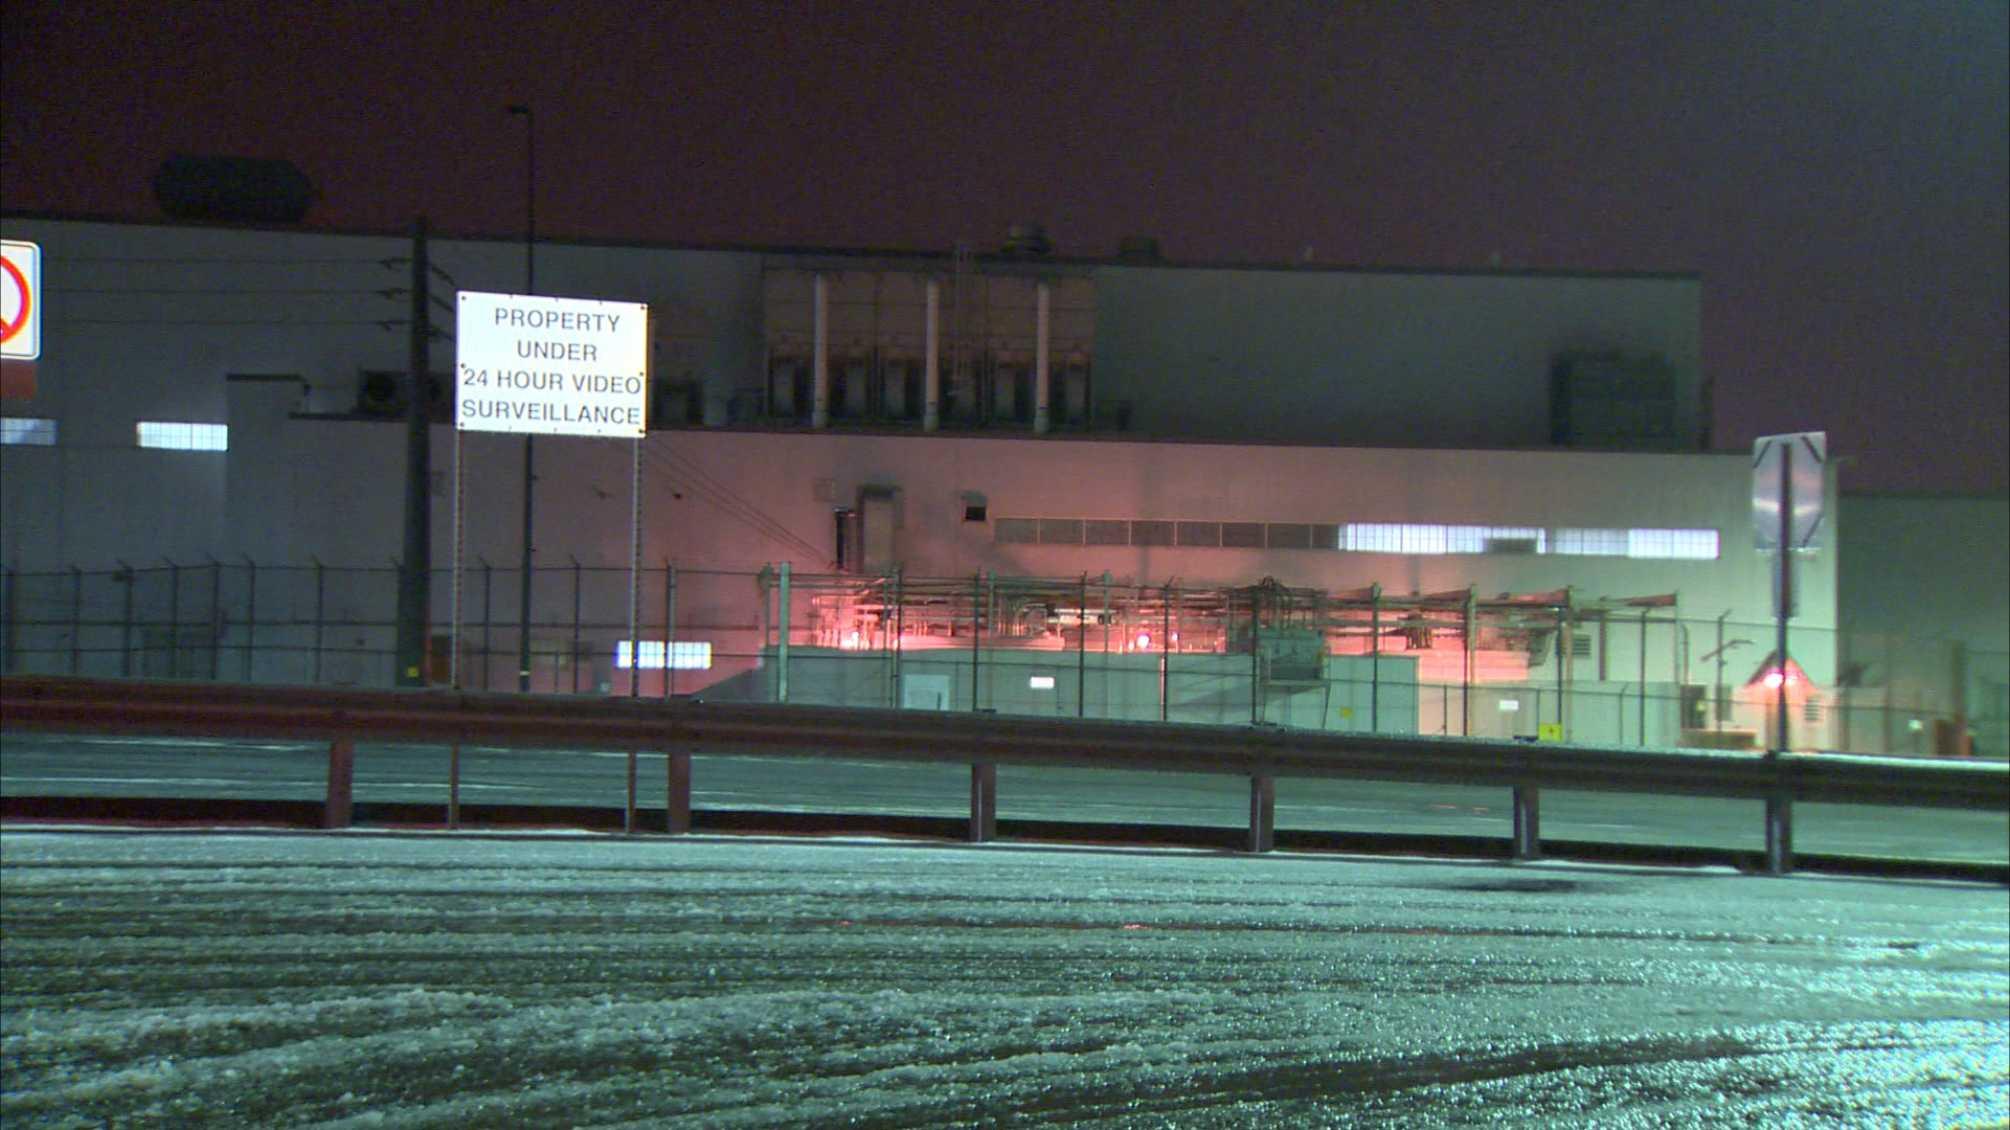 Bettis Atomic Power Laboratory